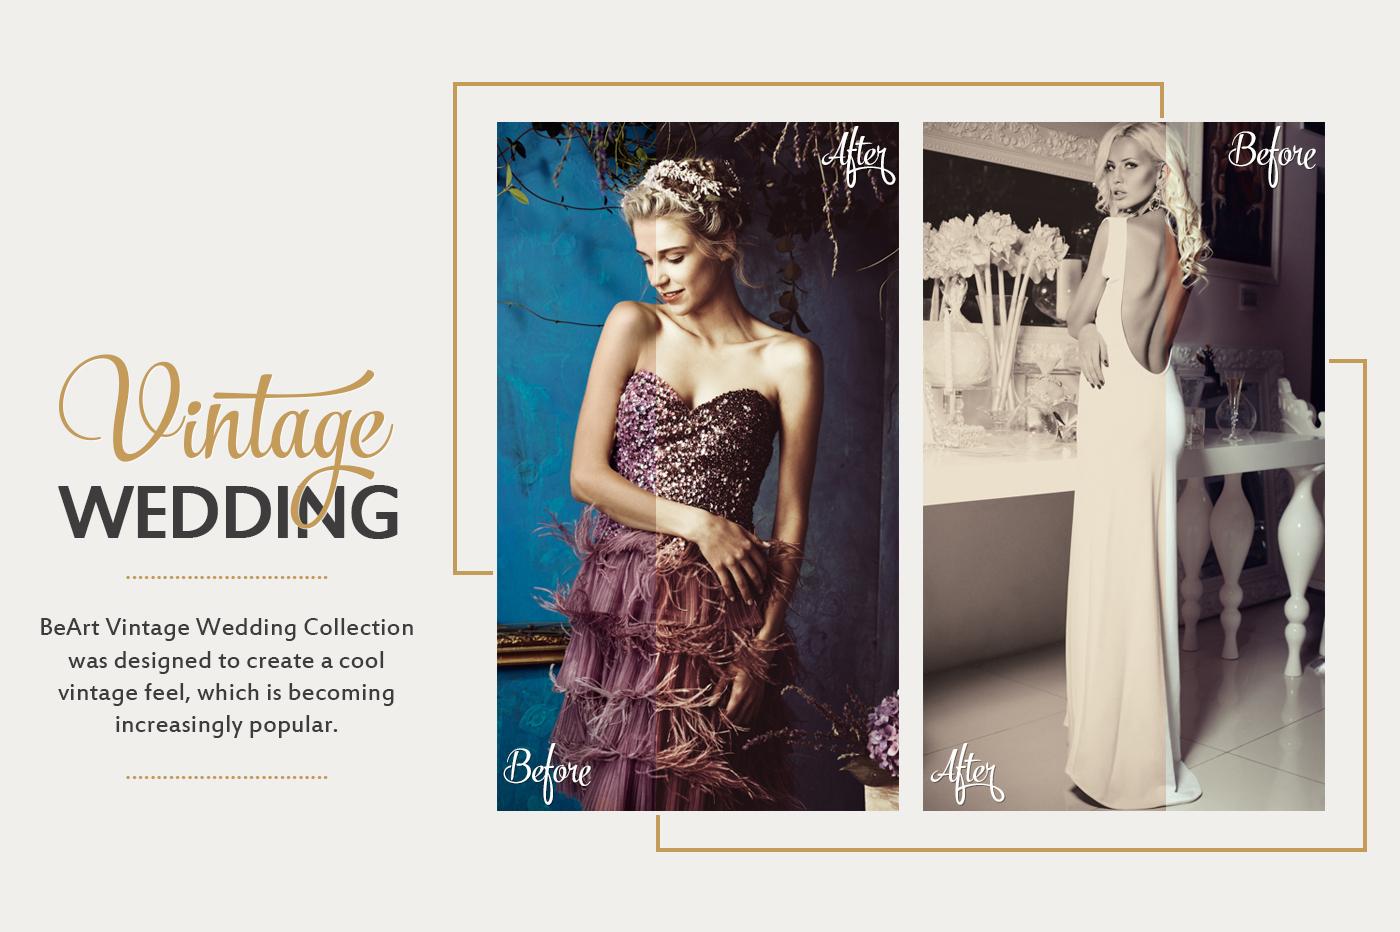 Vintage Wedding Lightroom Presets, Photoshop actions & Camera RAW Presets by @BeArtPresets